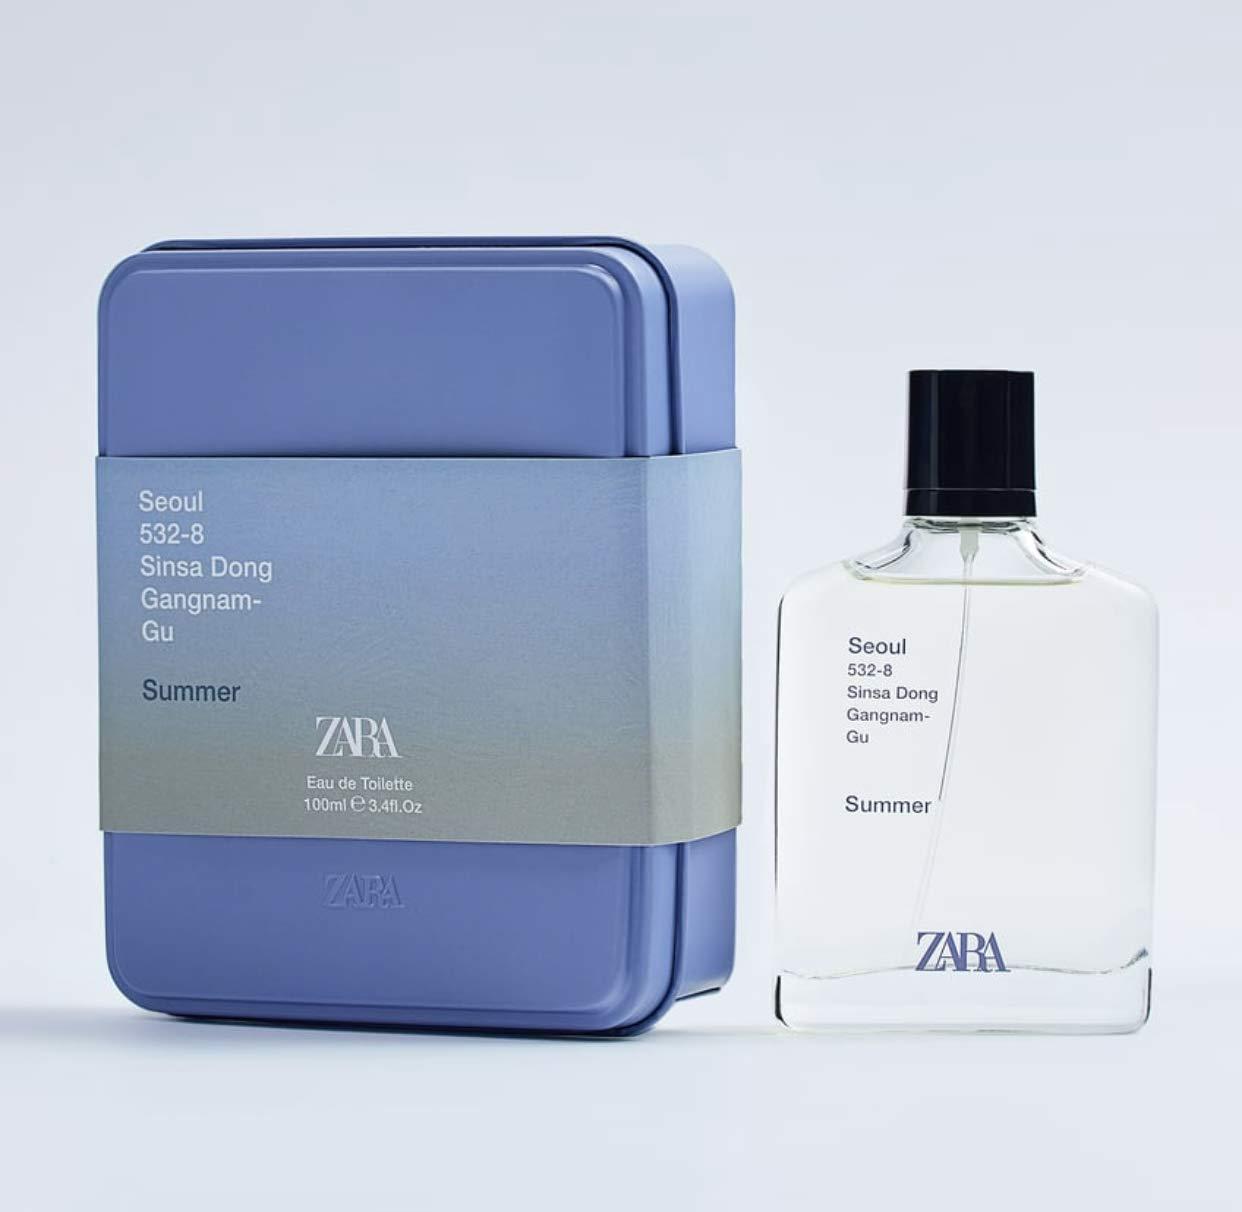 ZARA SEOUL SUMMER EDT Eau De Toilette 100 ML / 3.4 FL. OZ MEN'S FRAGRANCE/Men's Perfume/Cologne